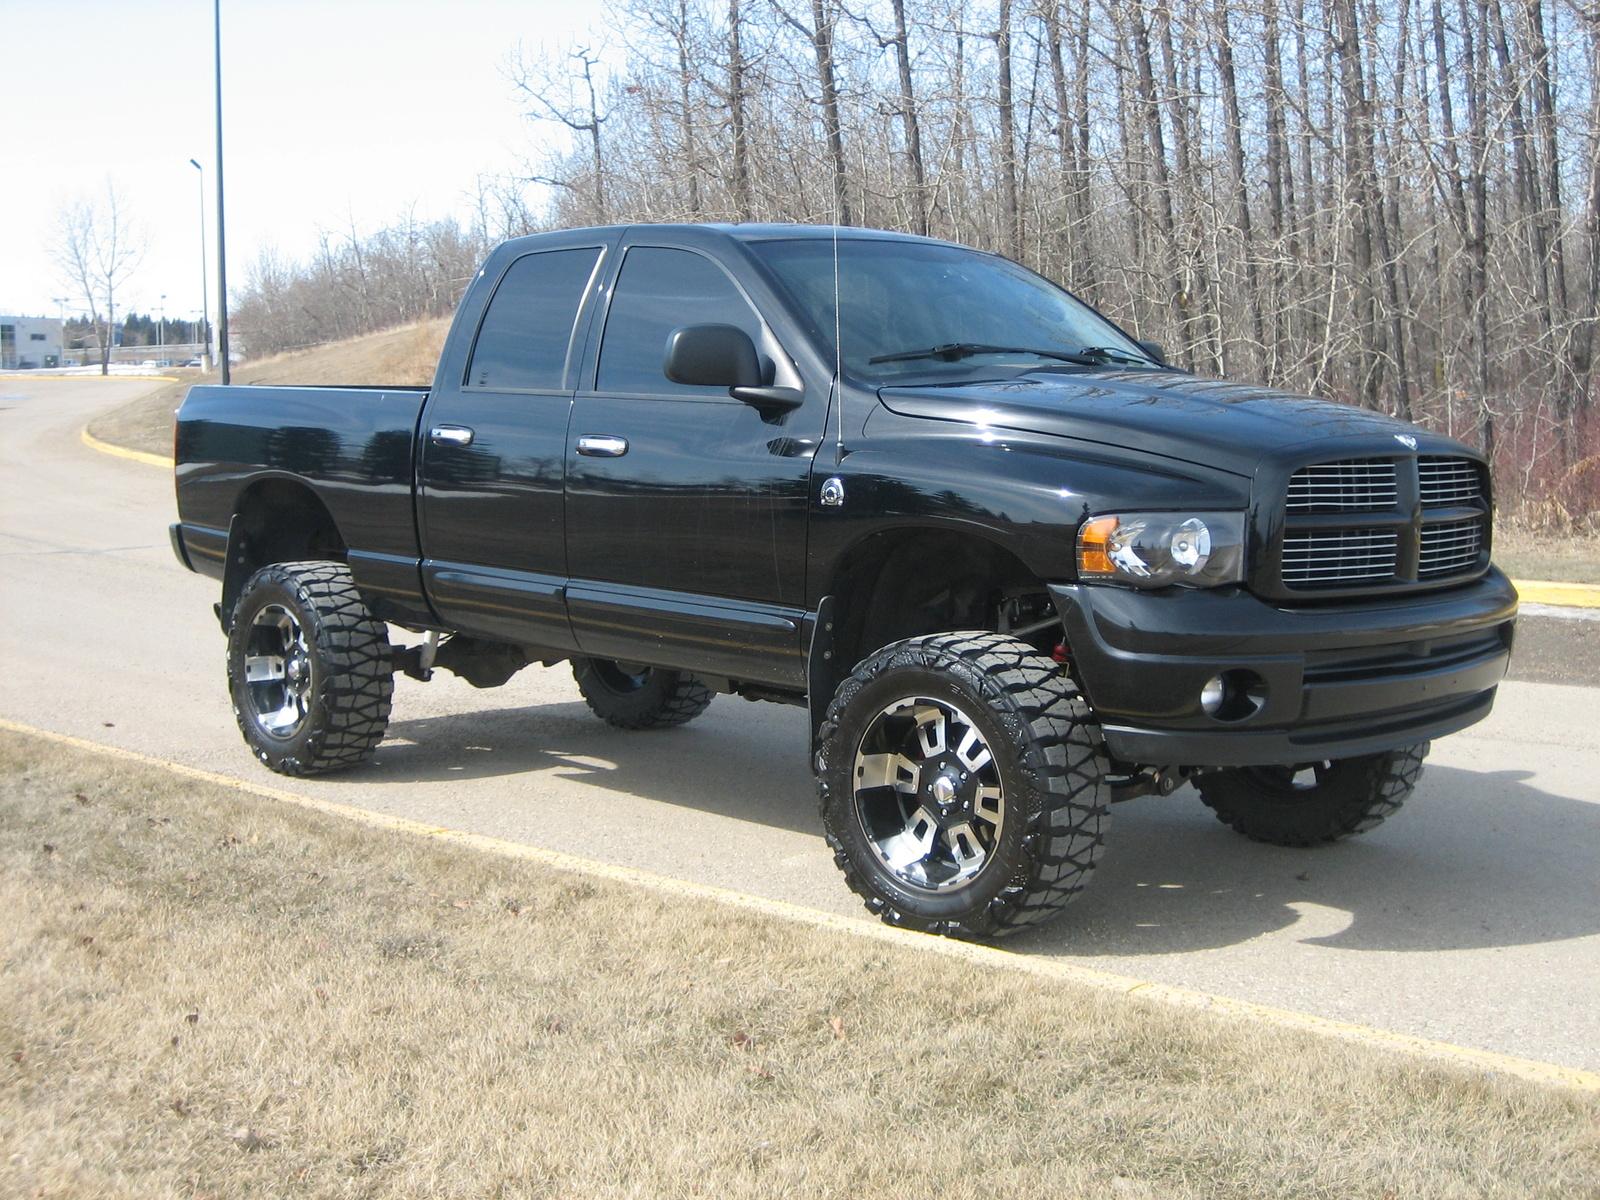 91 dodge truck galleryhip com the hippest galleries -  Dodge Ram Pickup 1500 10